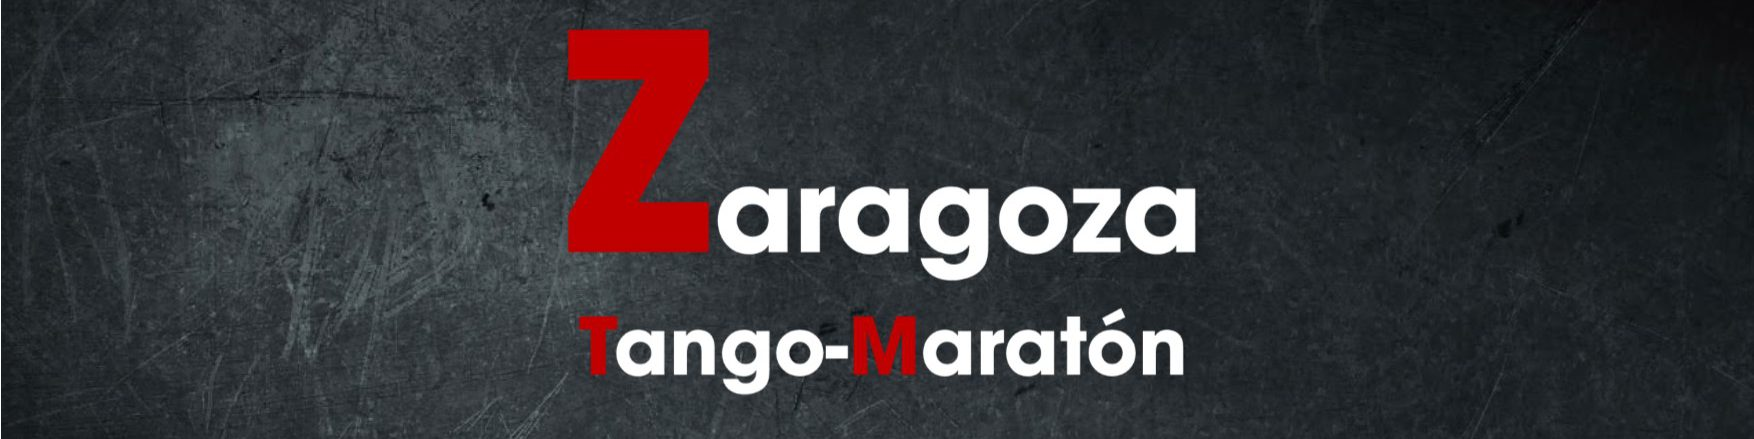 Zaragoza tango maraton